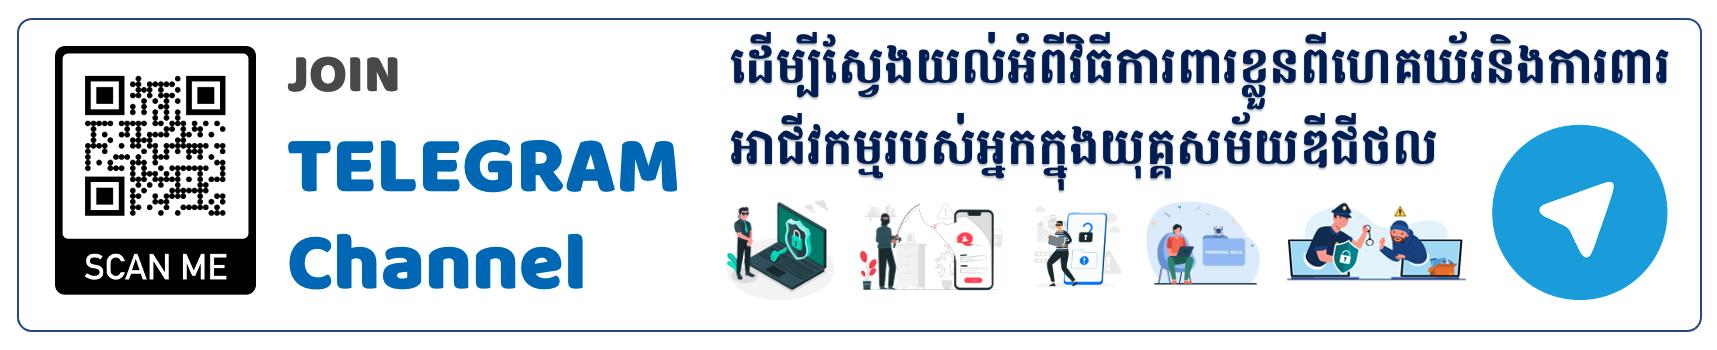 ISAC Cambodia (InfoSec)